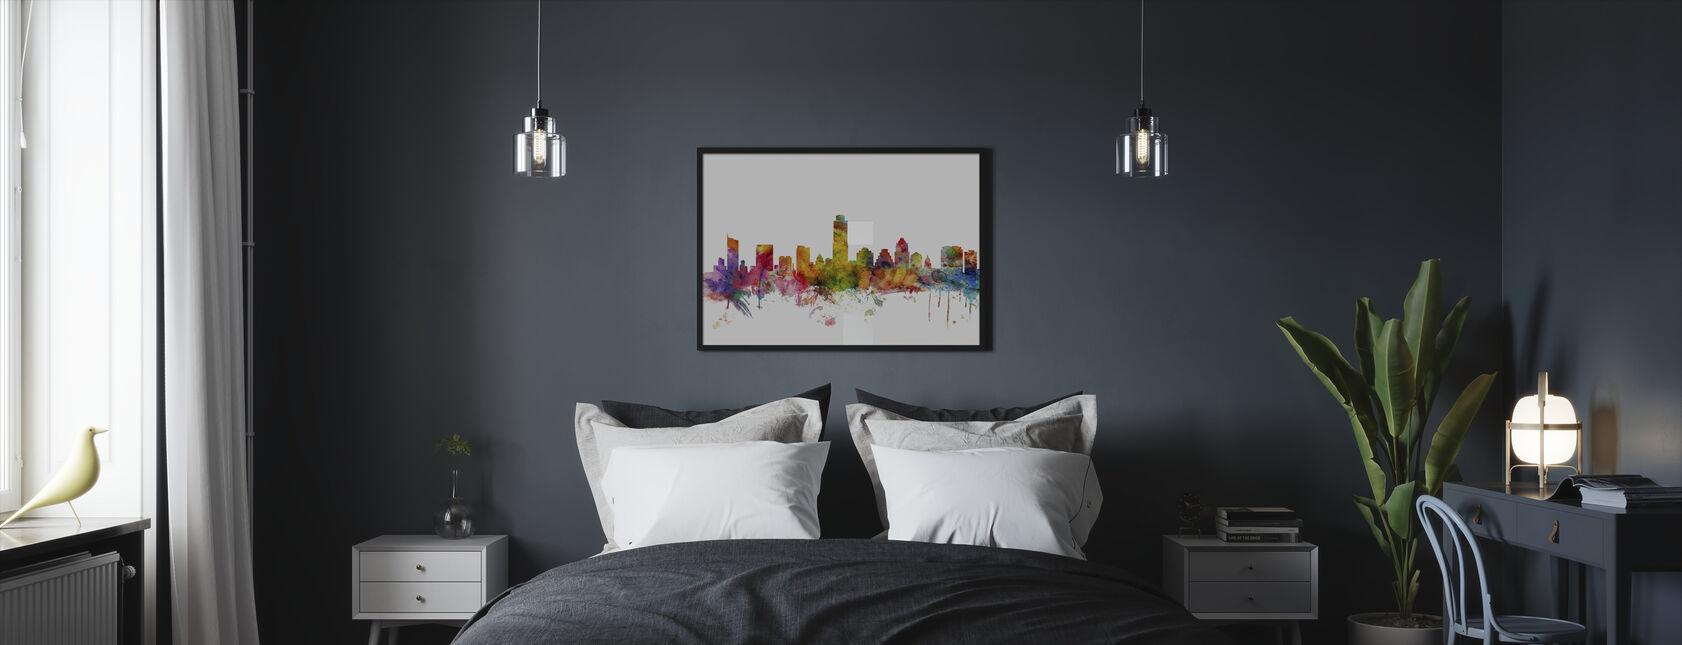 Austin Texas Skyline - Framed print - Bedroom